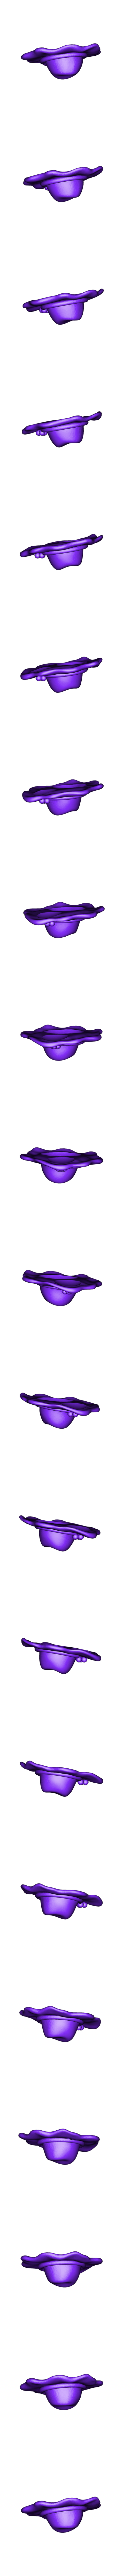 frog-light-hat.stl Download free STL file Traveling Blue Frog - Yuanmei Lantern • 3D printing design, orangeteacher